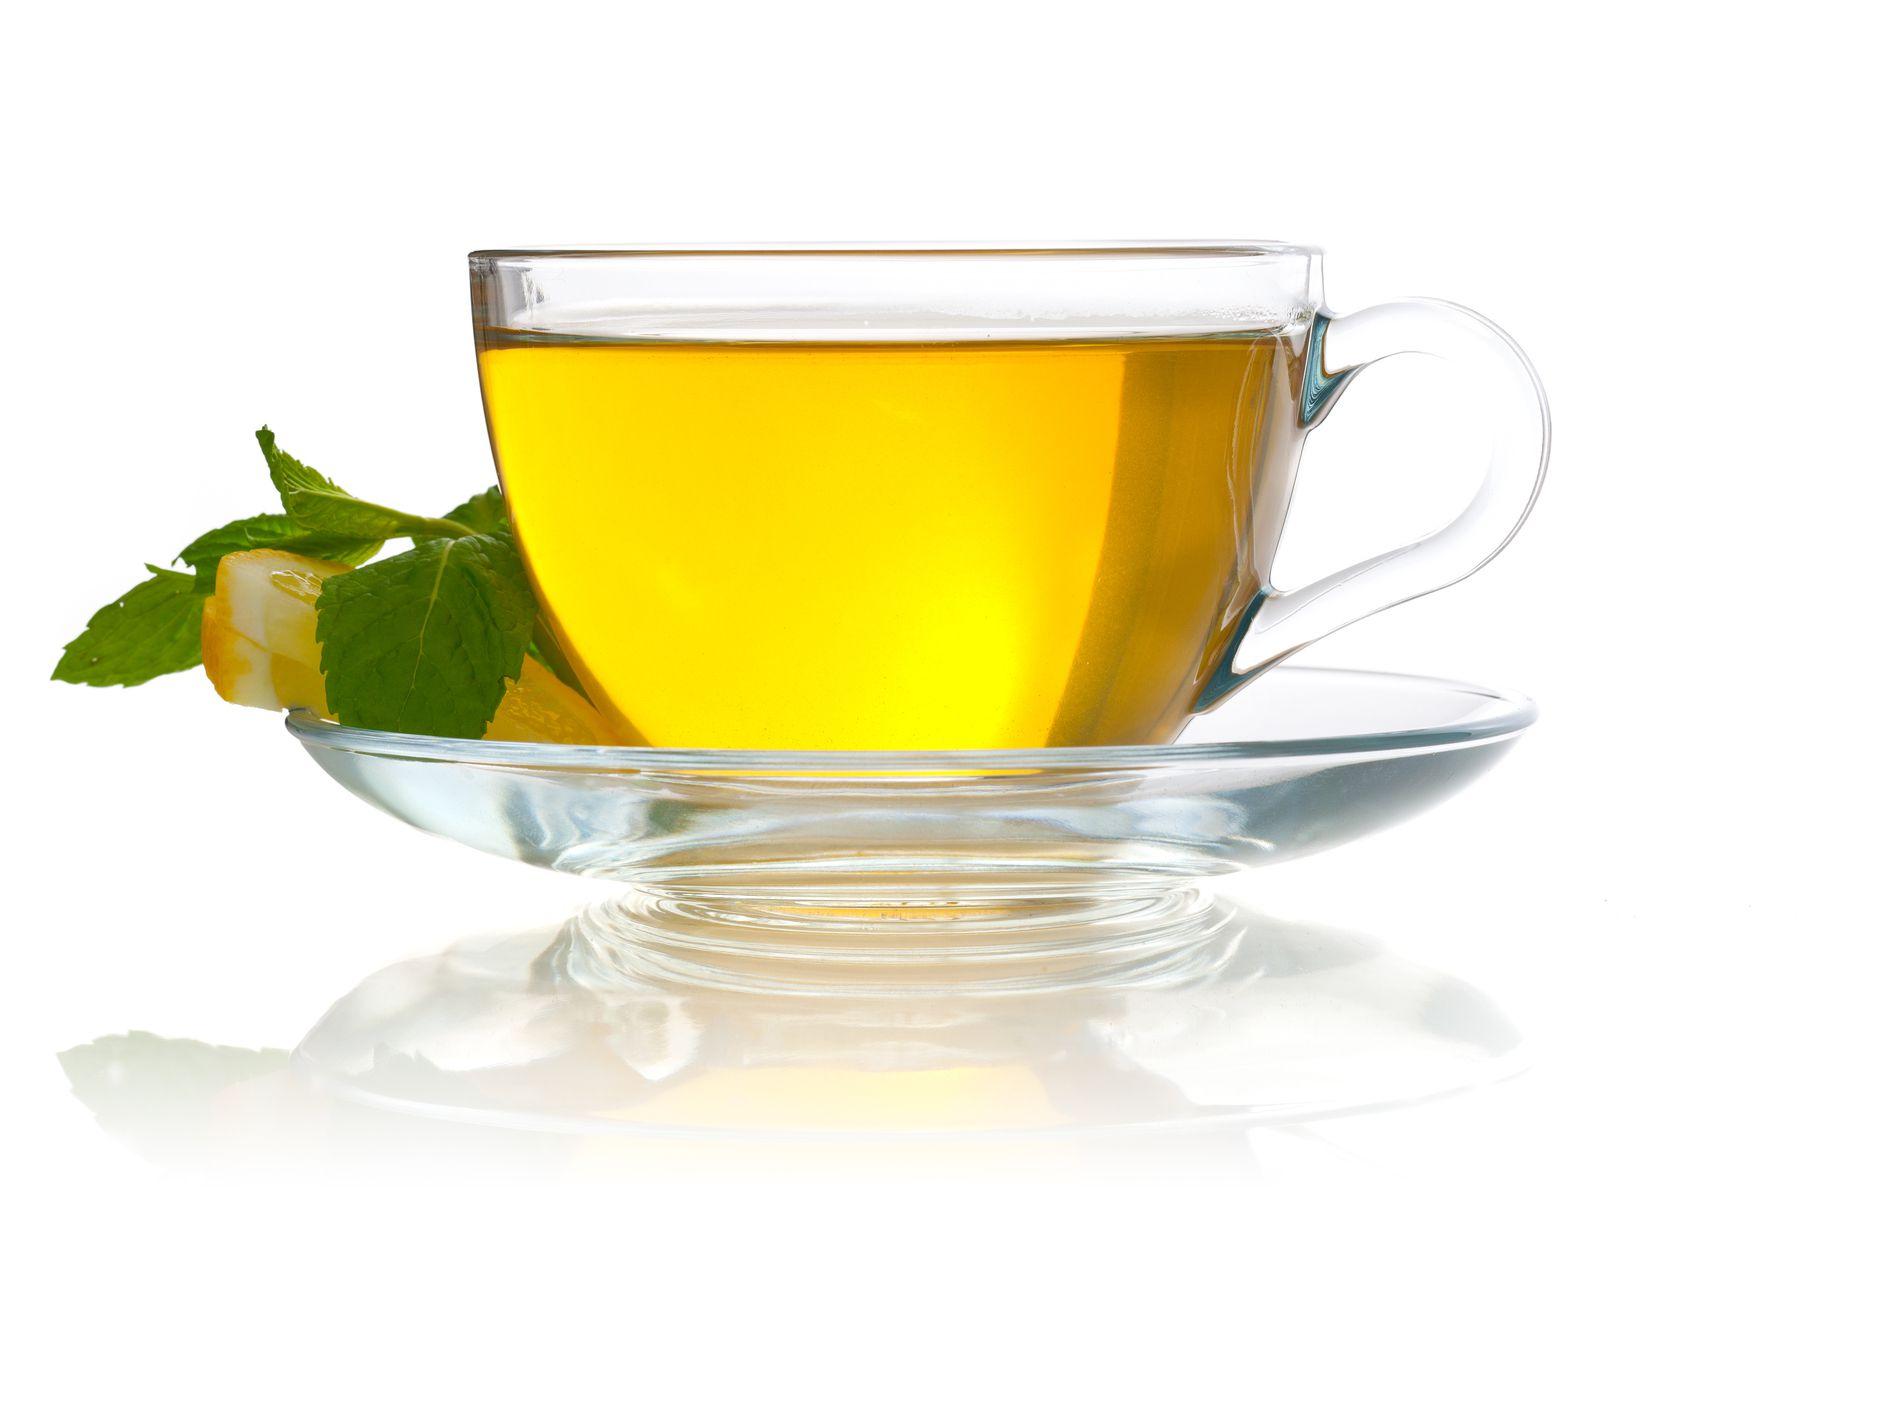 Detox Teas & Herbs - How to Detox With